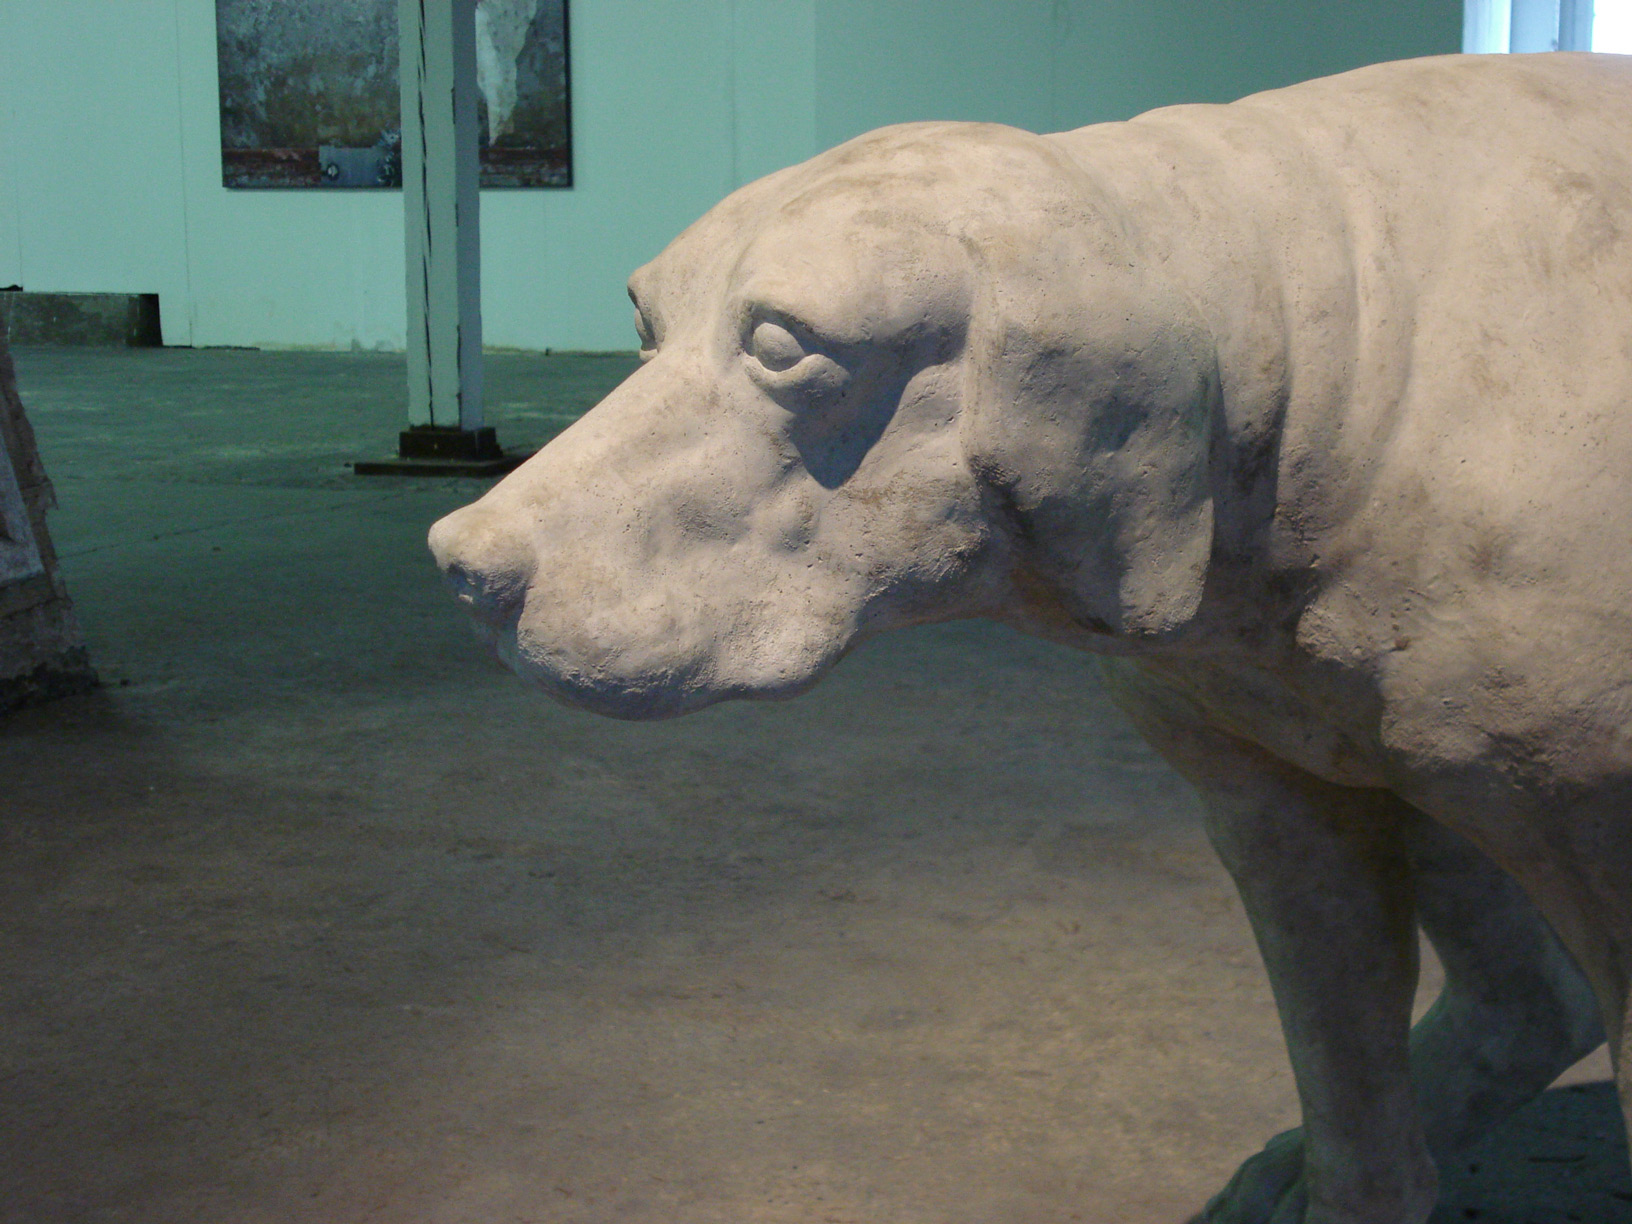 dog, urban, concrete, sculpture, fine art